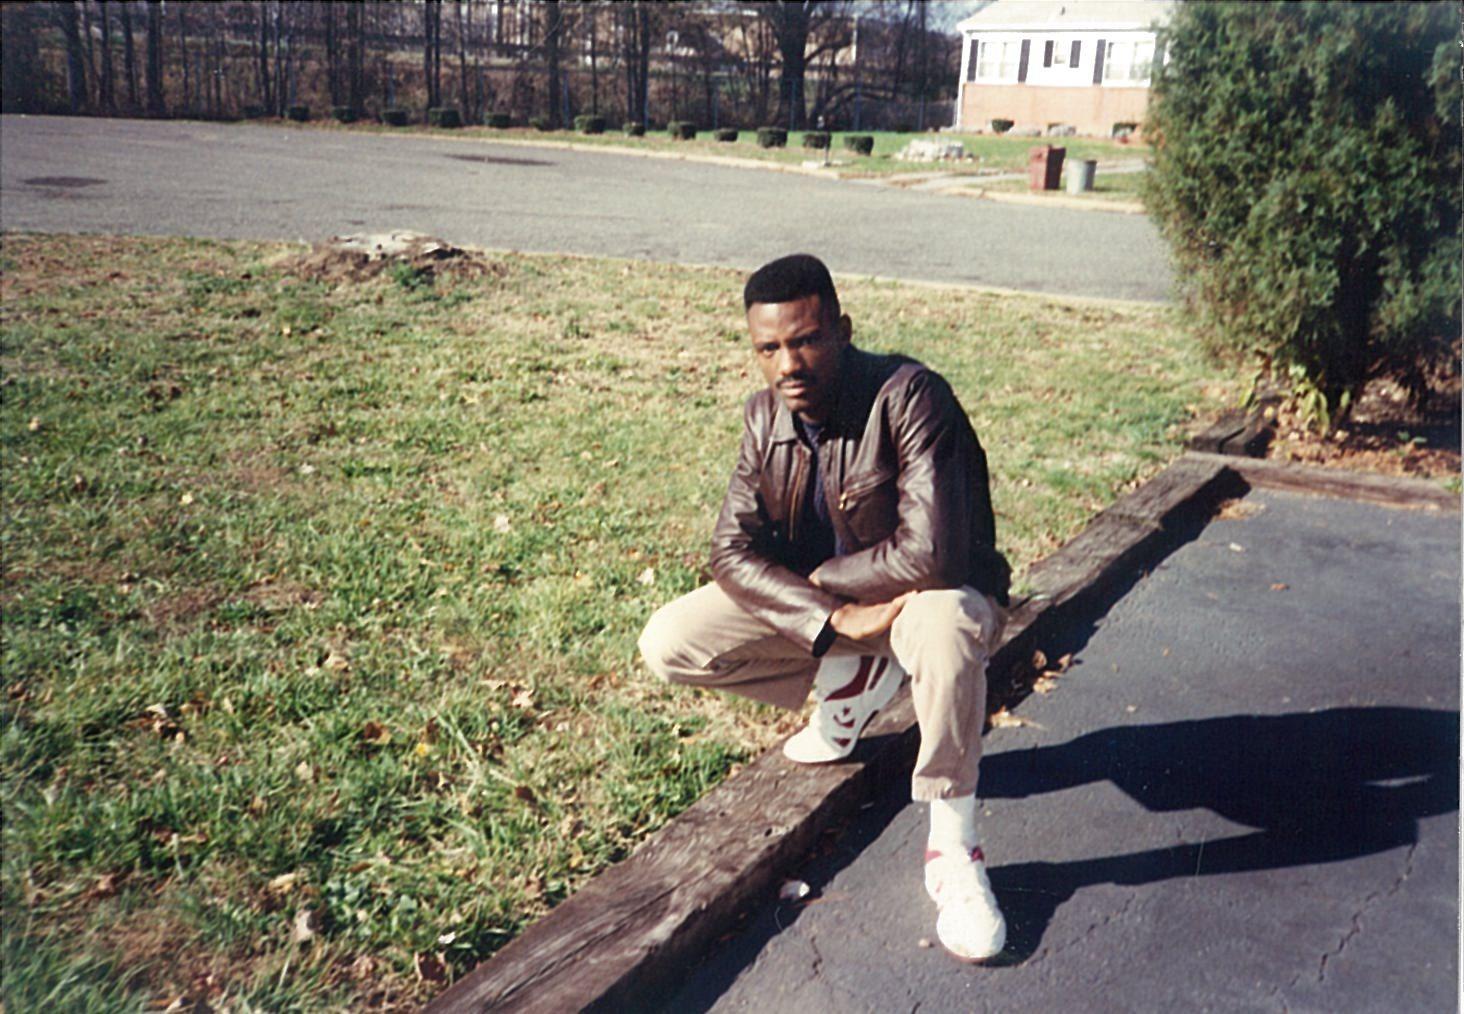 11/11/15 Driven to hospital, Virginia man tased, shackled